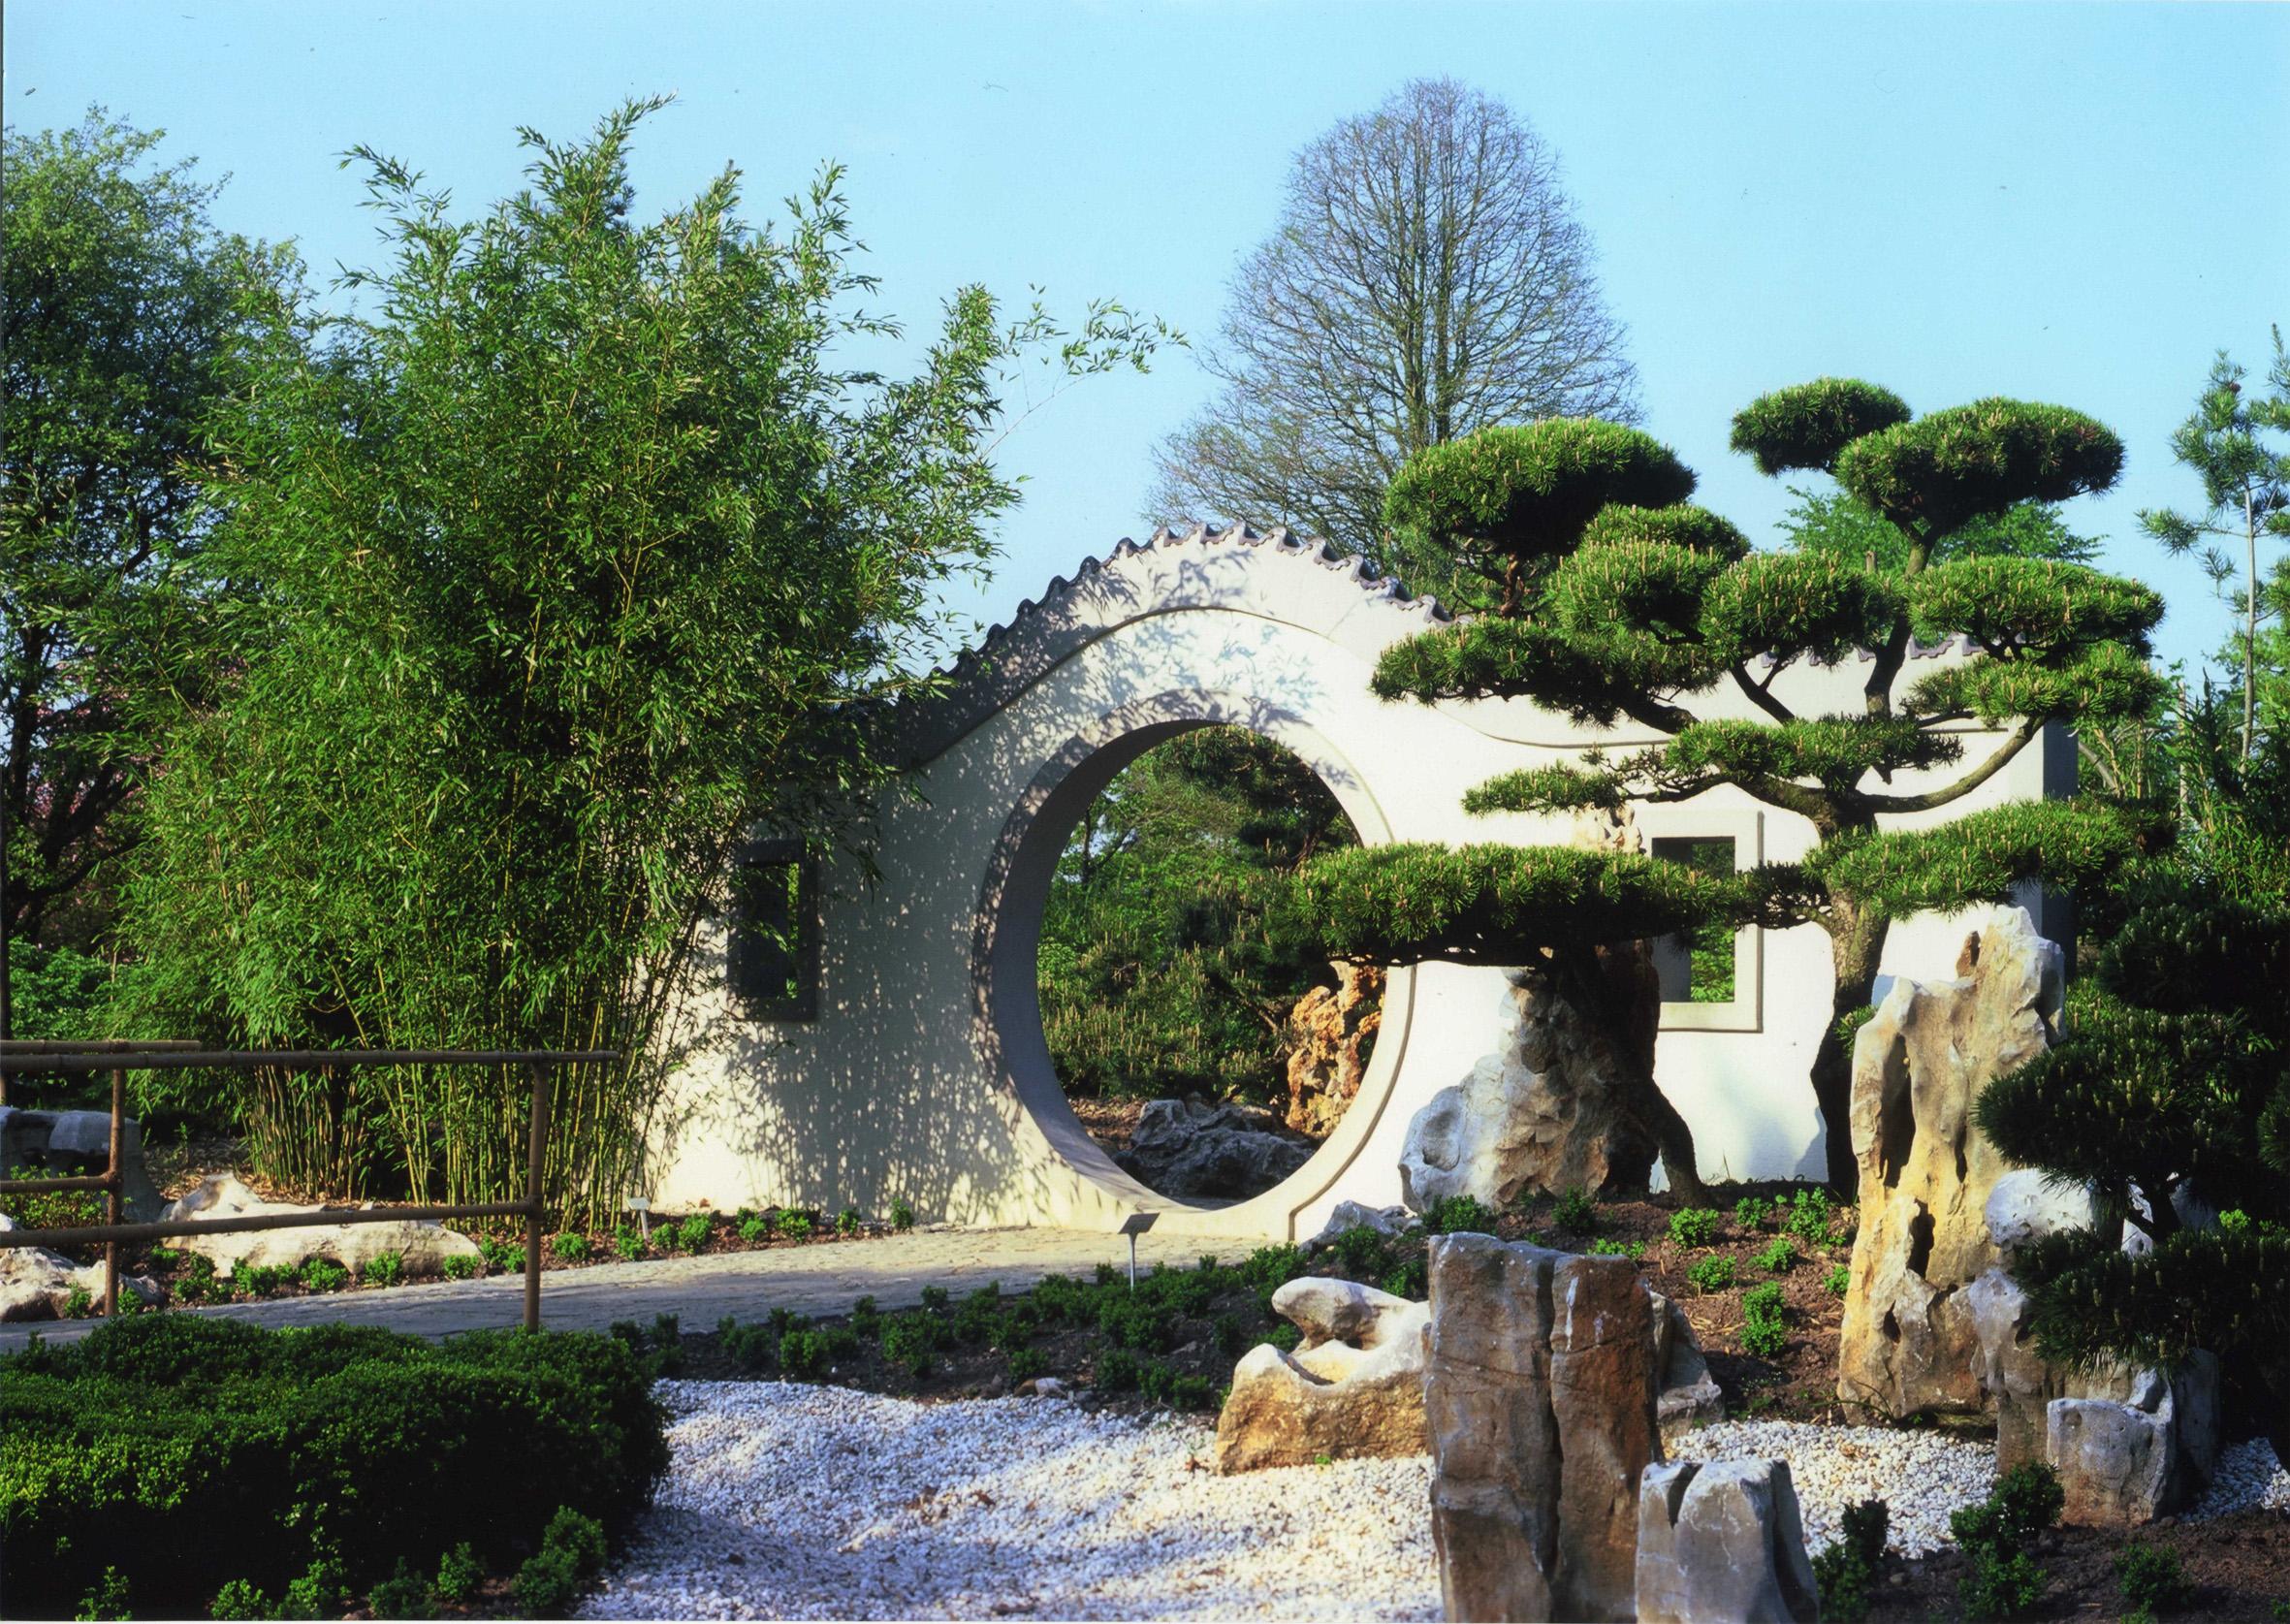 file:arboretum ellerhoop - chinesischer garten - wikimedia commons, Garten und erstellen